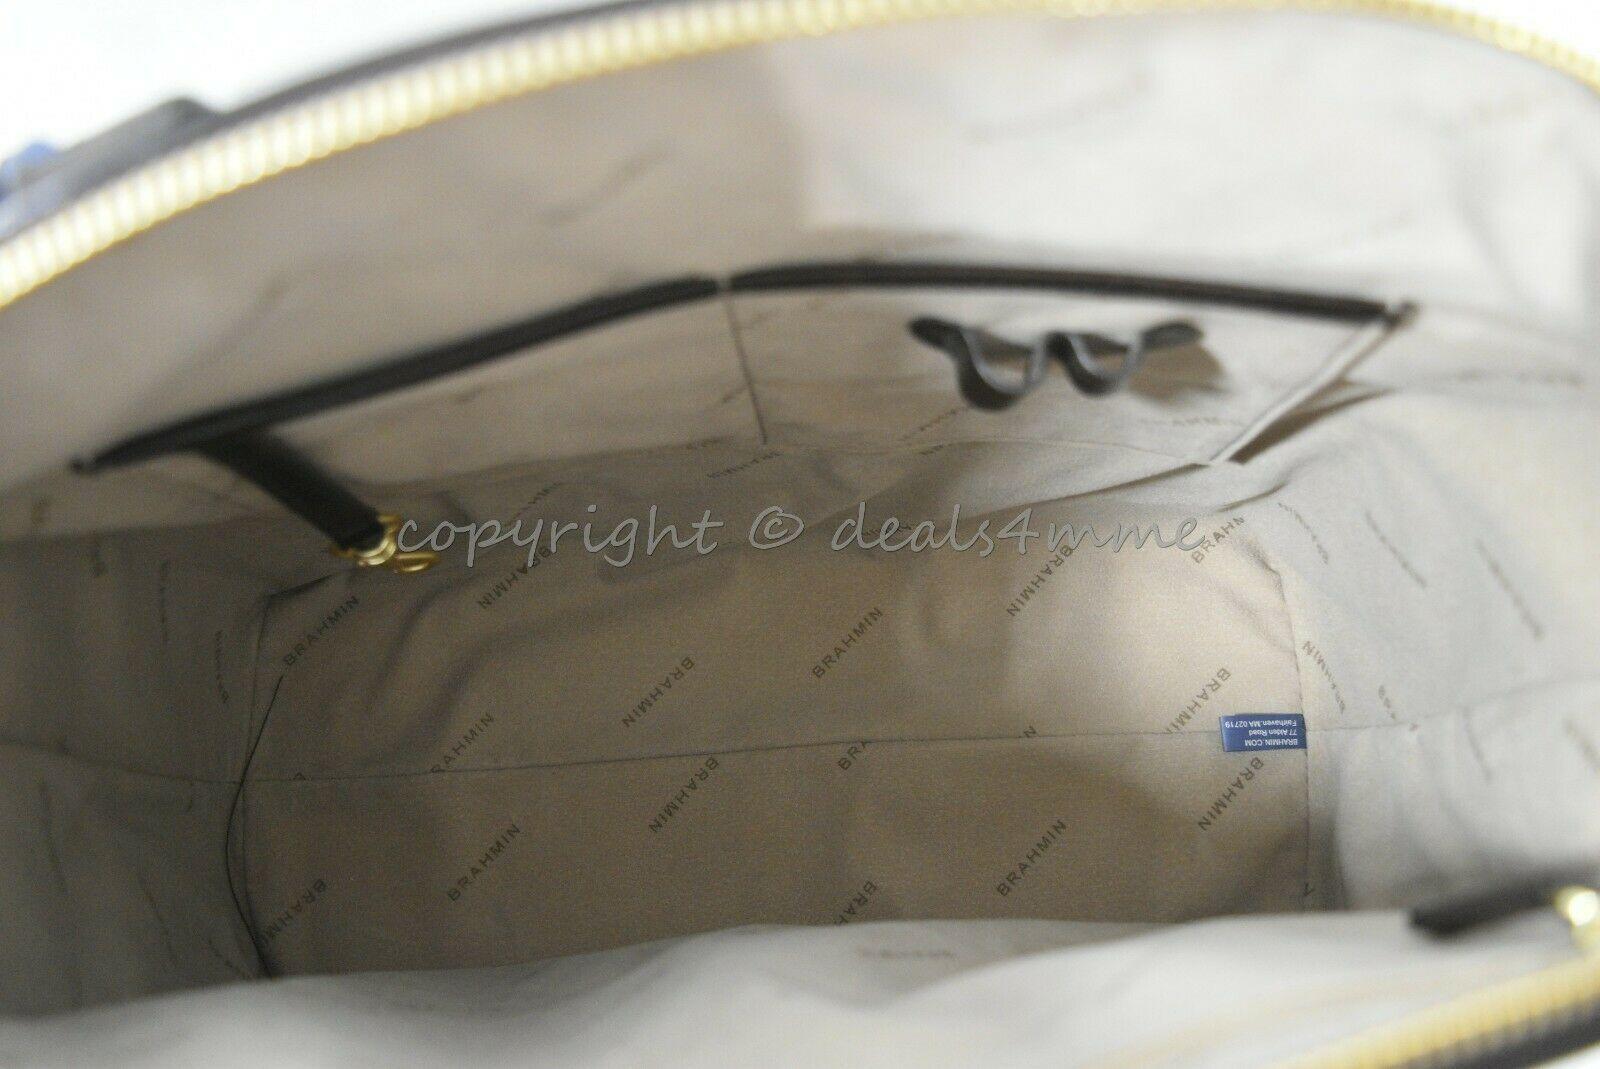 NWT Brahmin Large Duxbury Smooth Leather Satchel/Shoulder Bag in Sand Westport image 8